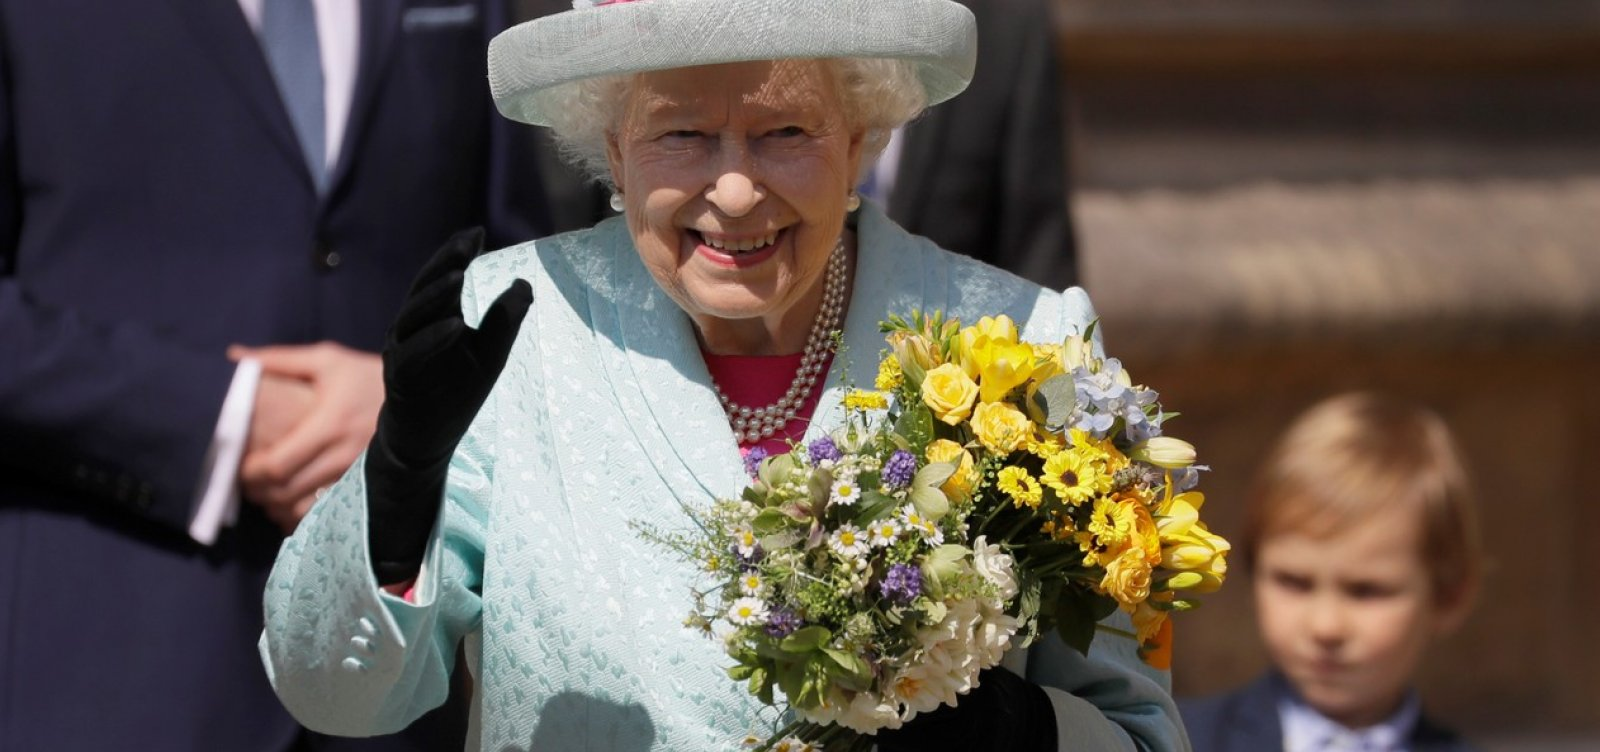 Rainha Elizabeth II completa 93 anos neste domingo